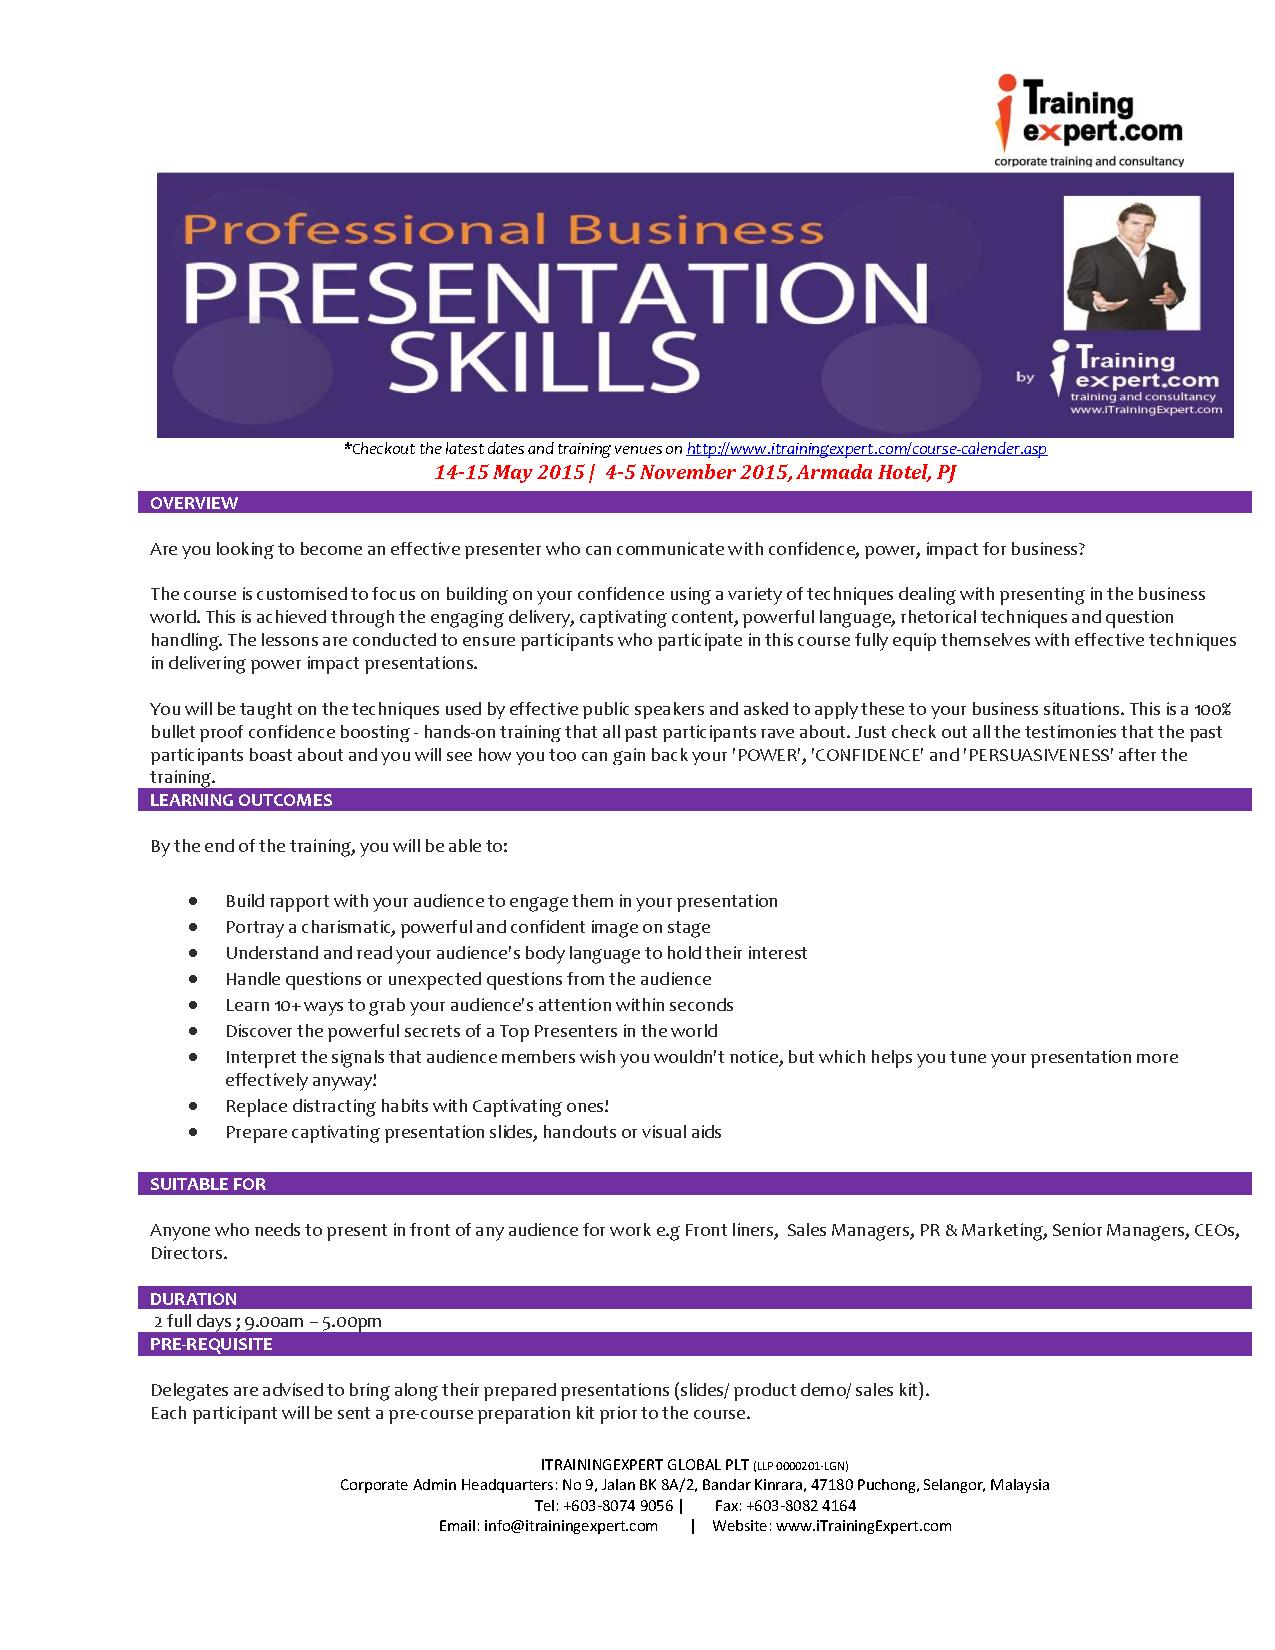 professional business presentation skills by itrainingexpert 2015 sm